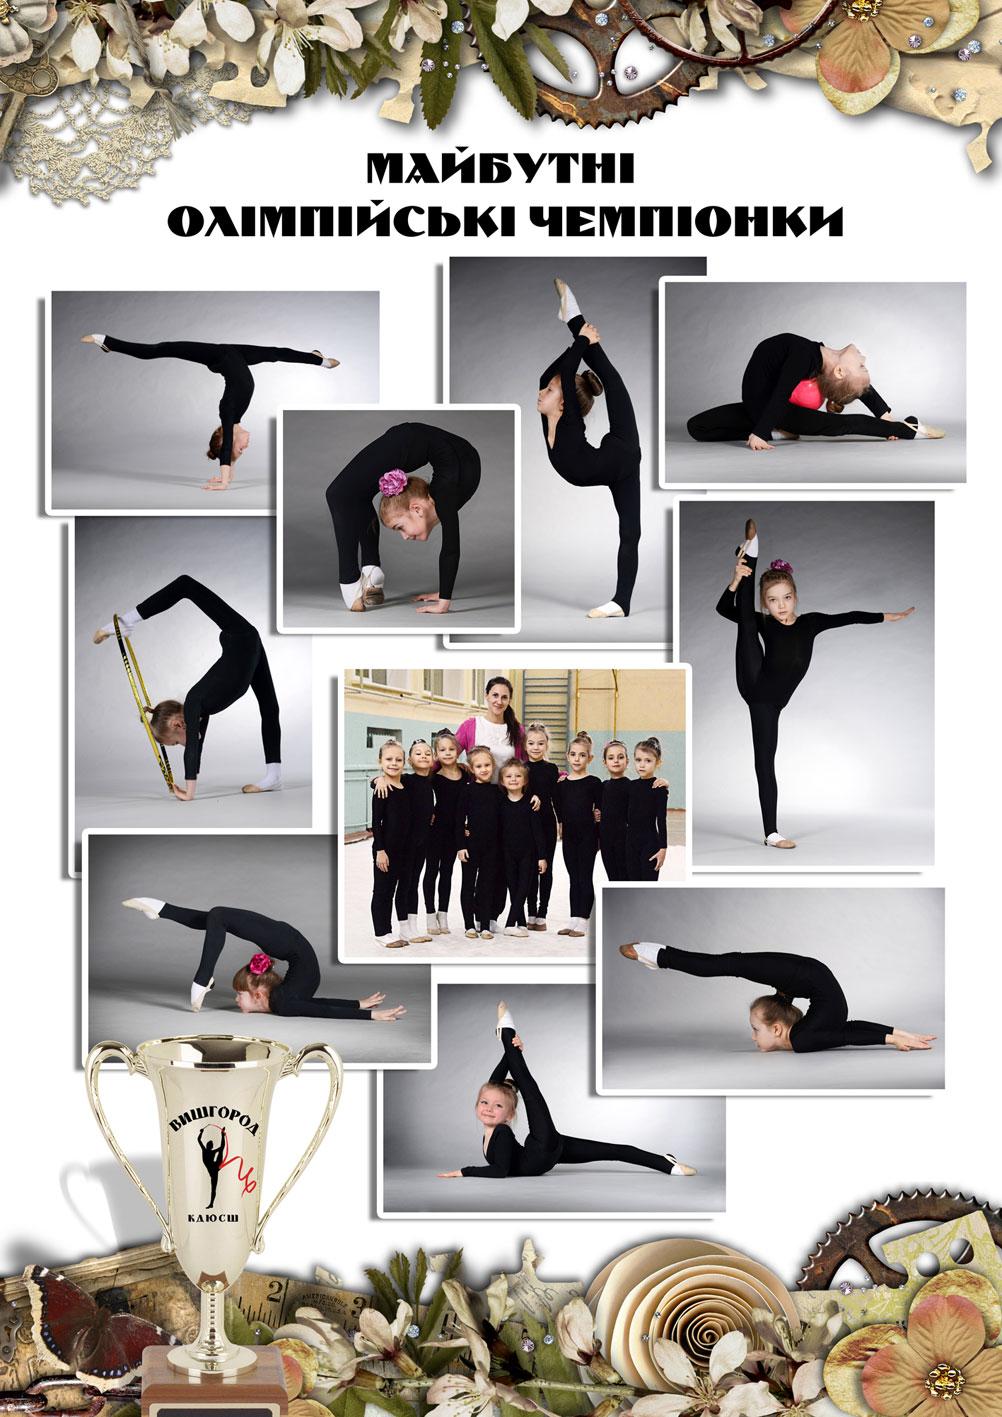 шпагат гимнастика фото знакомства: